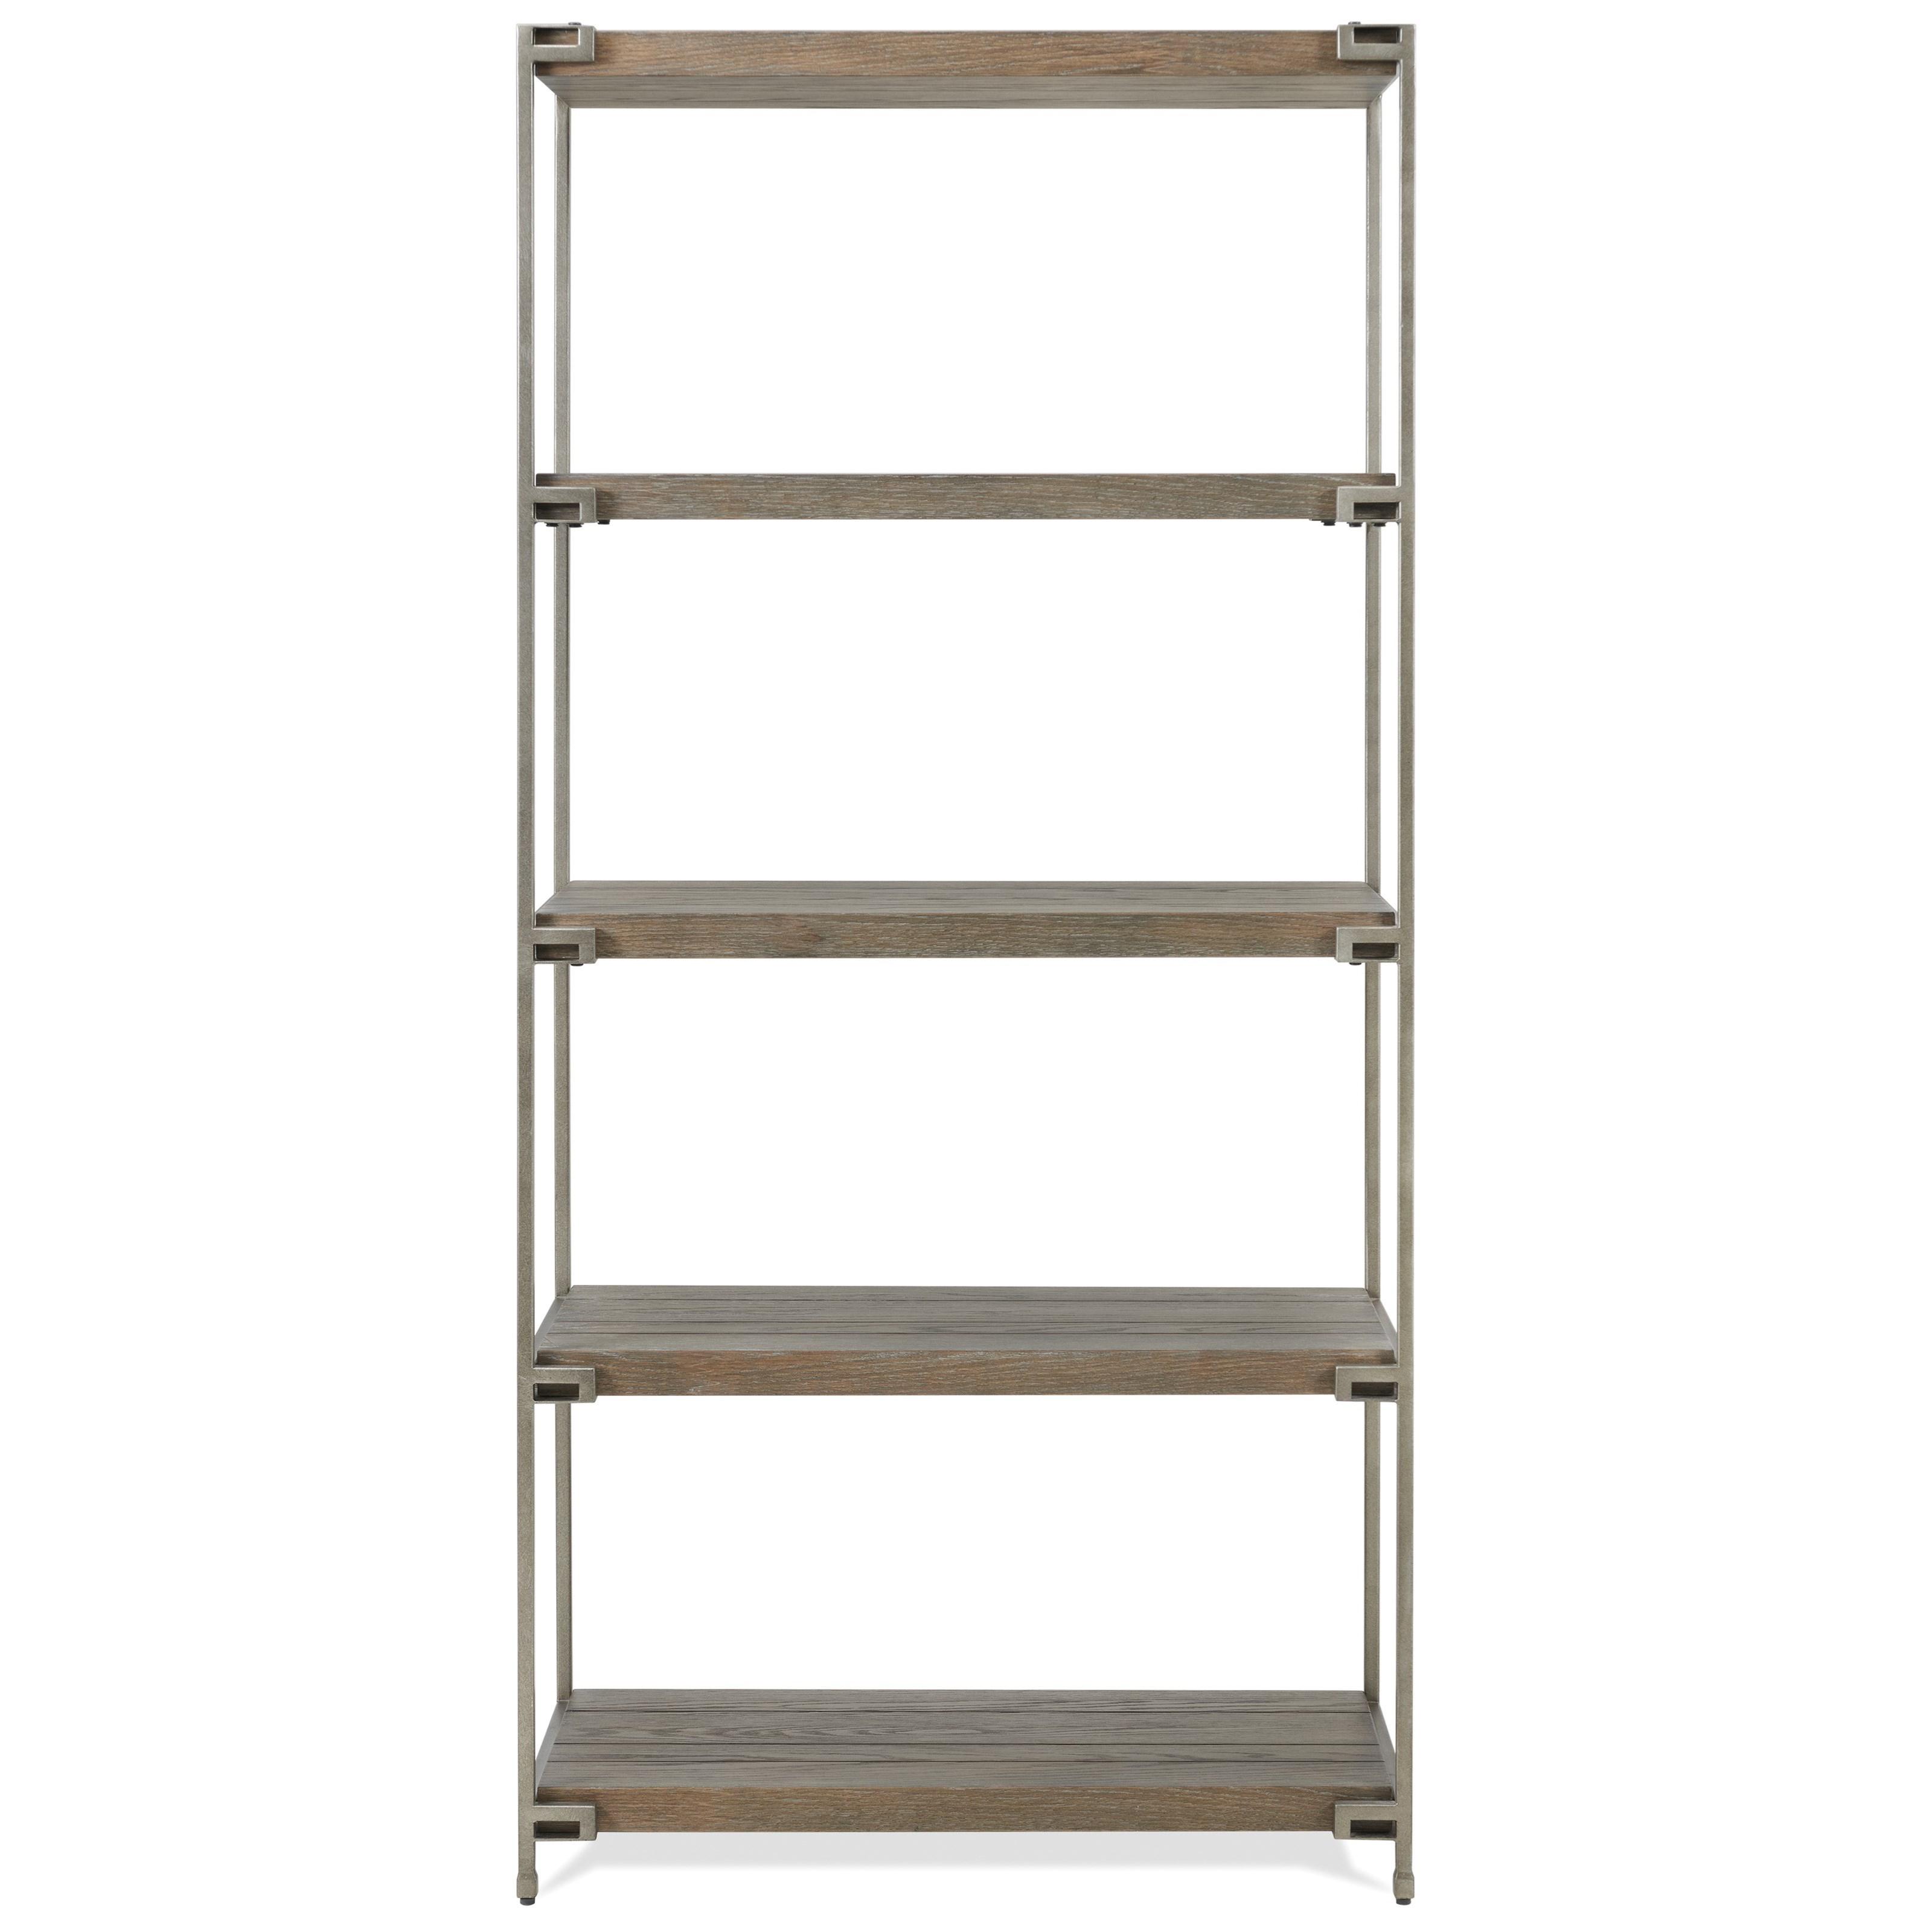 Wander Bookcase by Riverside Furniture at Mueller Furniture